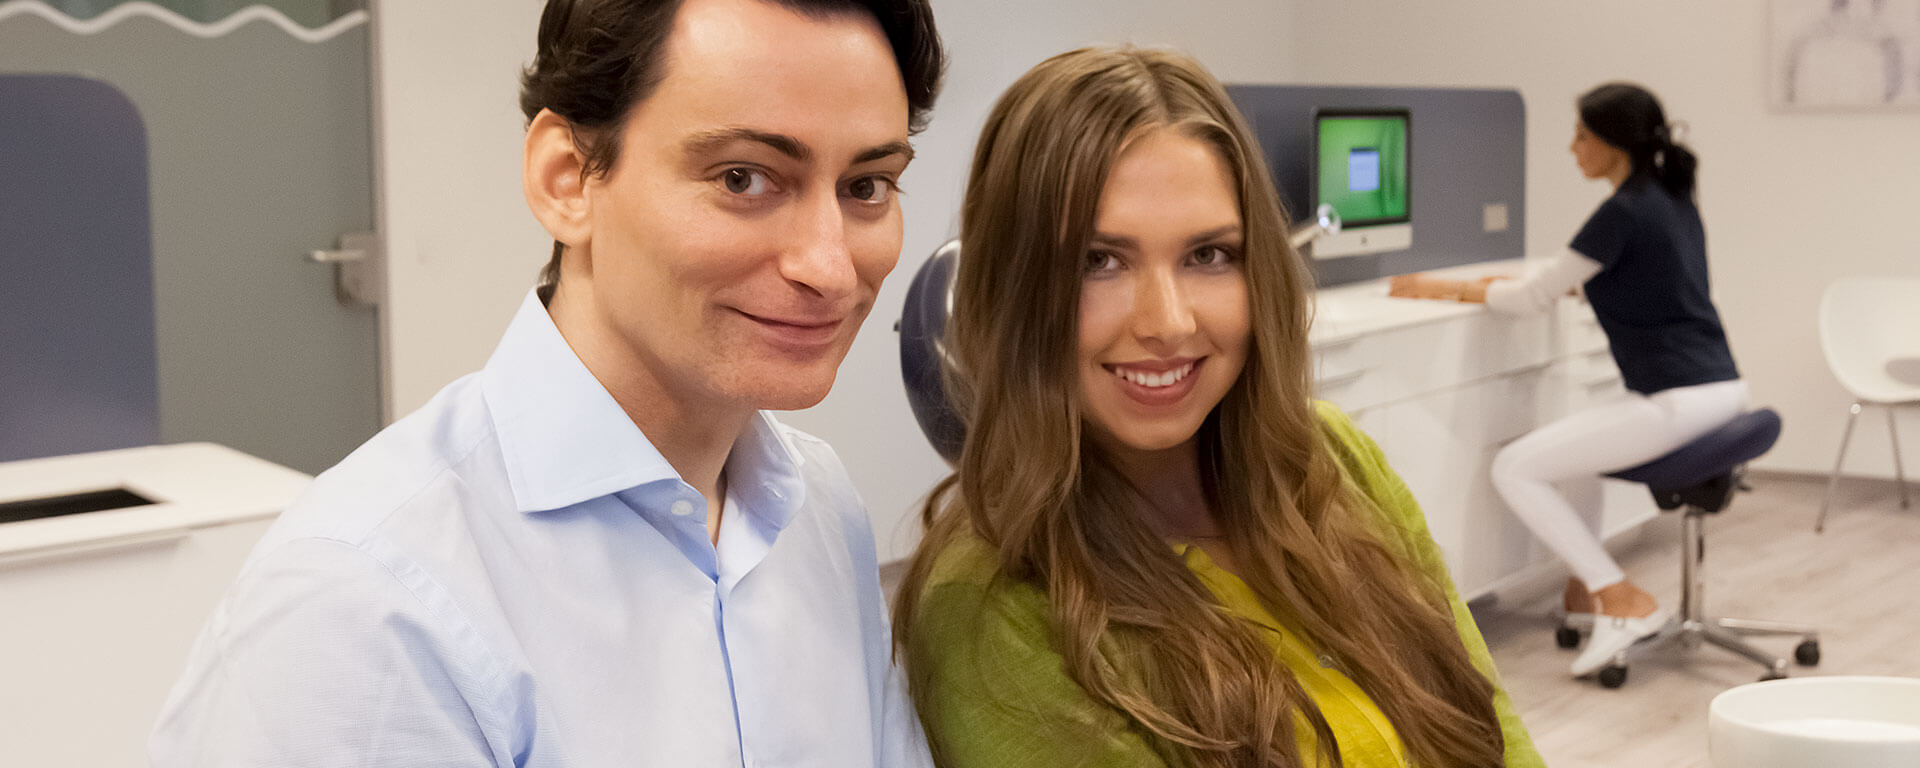 Kieferorthopäde Hamburg - Kieferorthopädie in der Welle - kieferorthopädische Behandlung